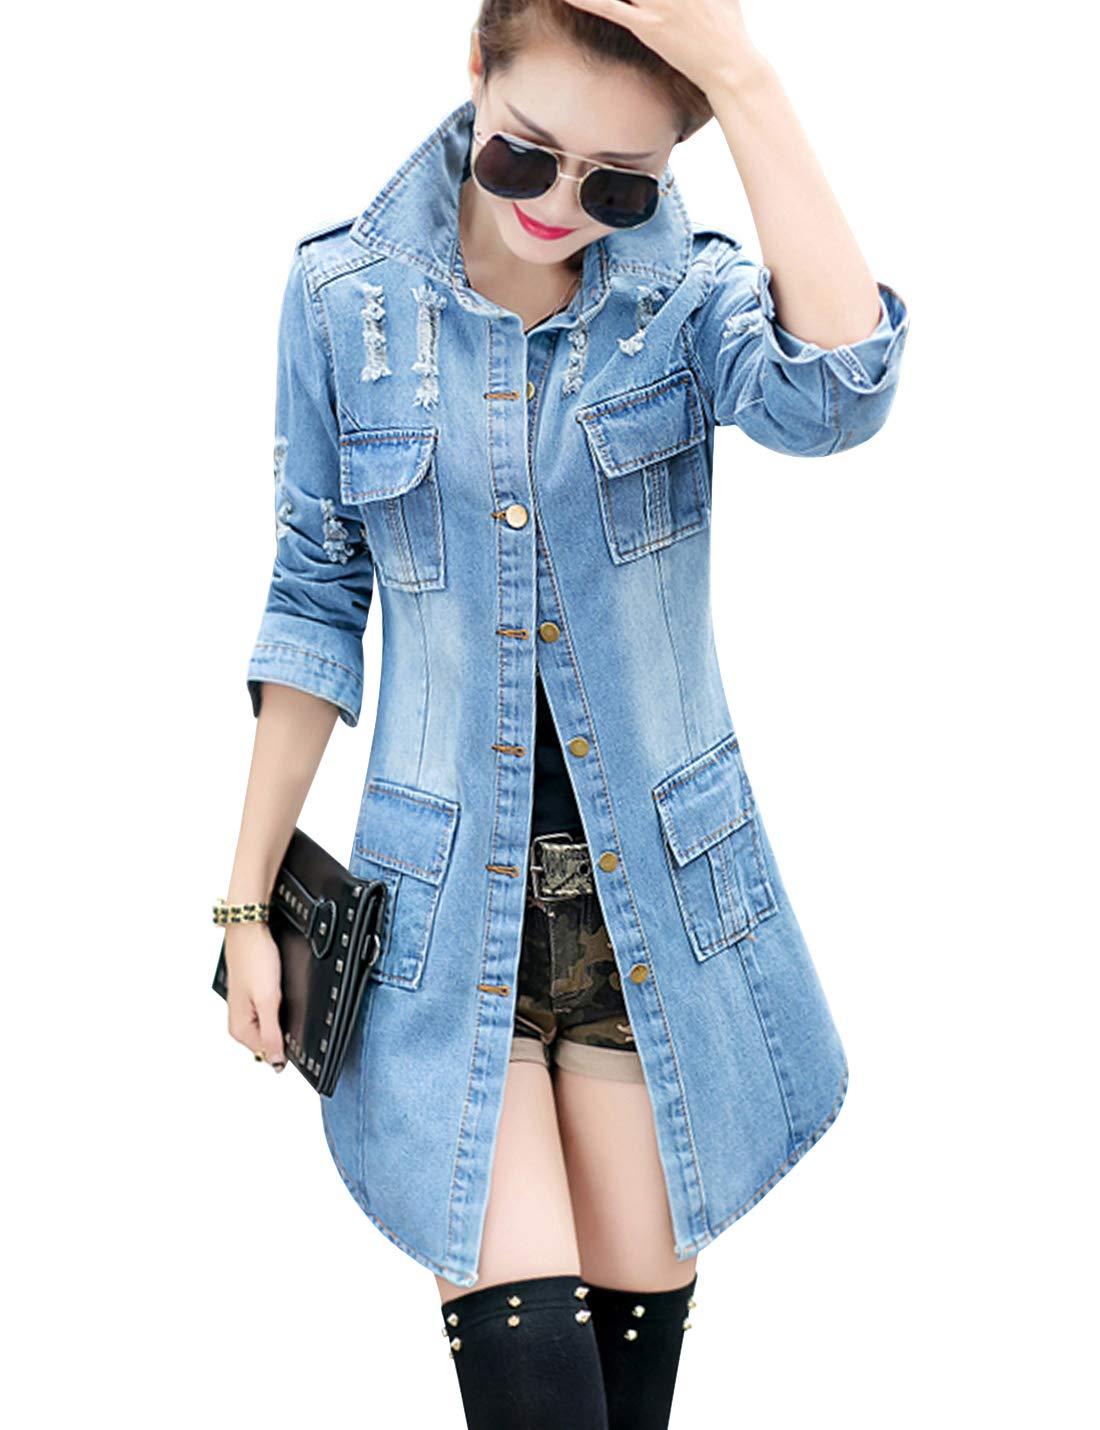 Tanming Women's Casual Lapel Slim Long Sleeve Denim Outercoat Jacket Windbreaker (XX-Large, Blue)